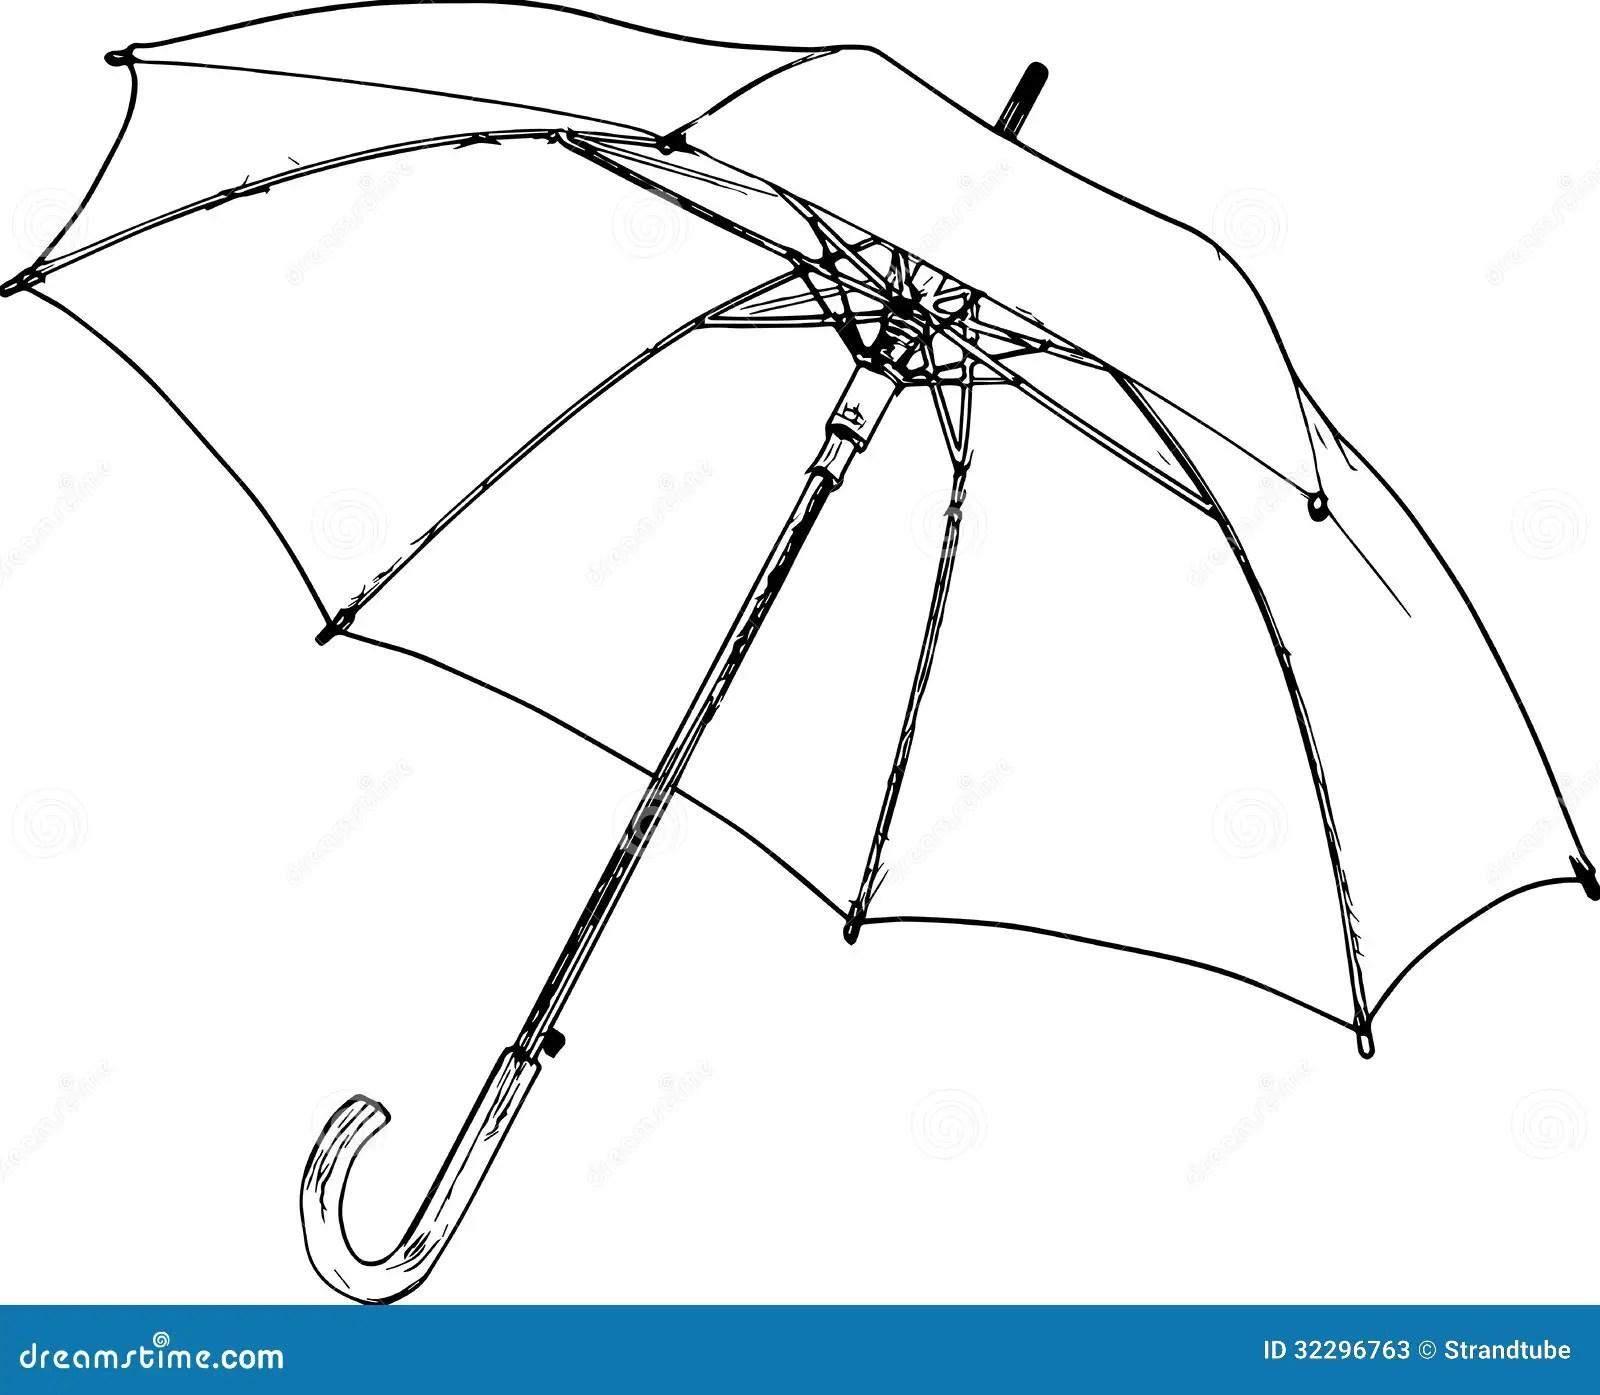 Stock Photo Umbrella Image